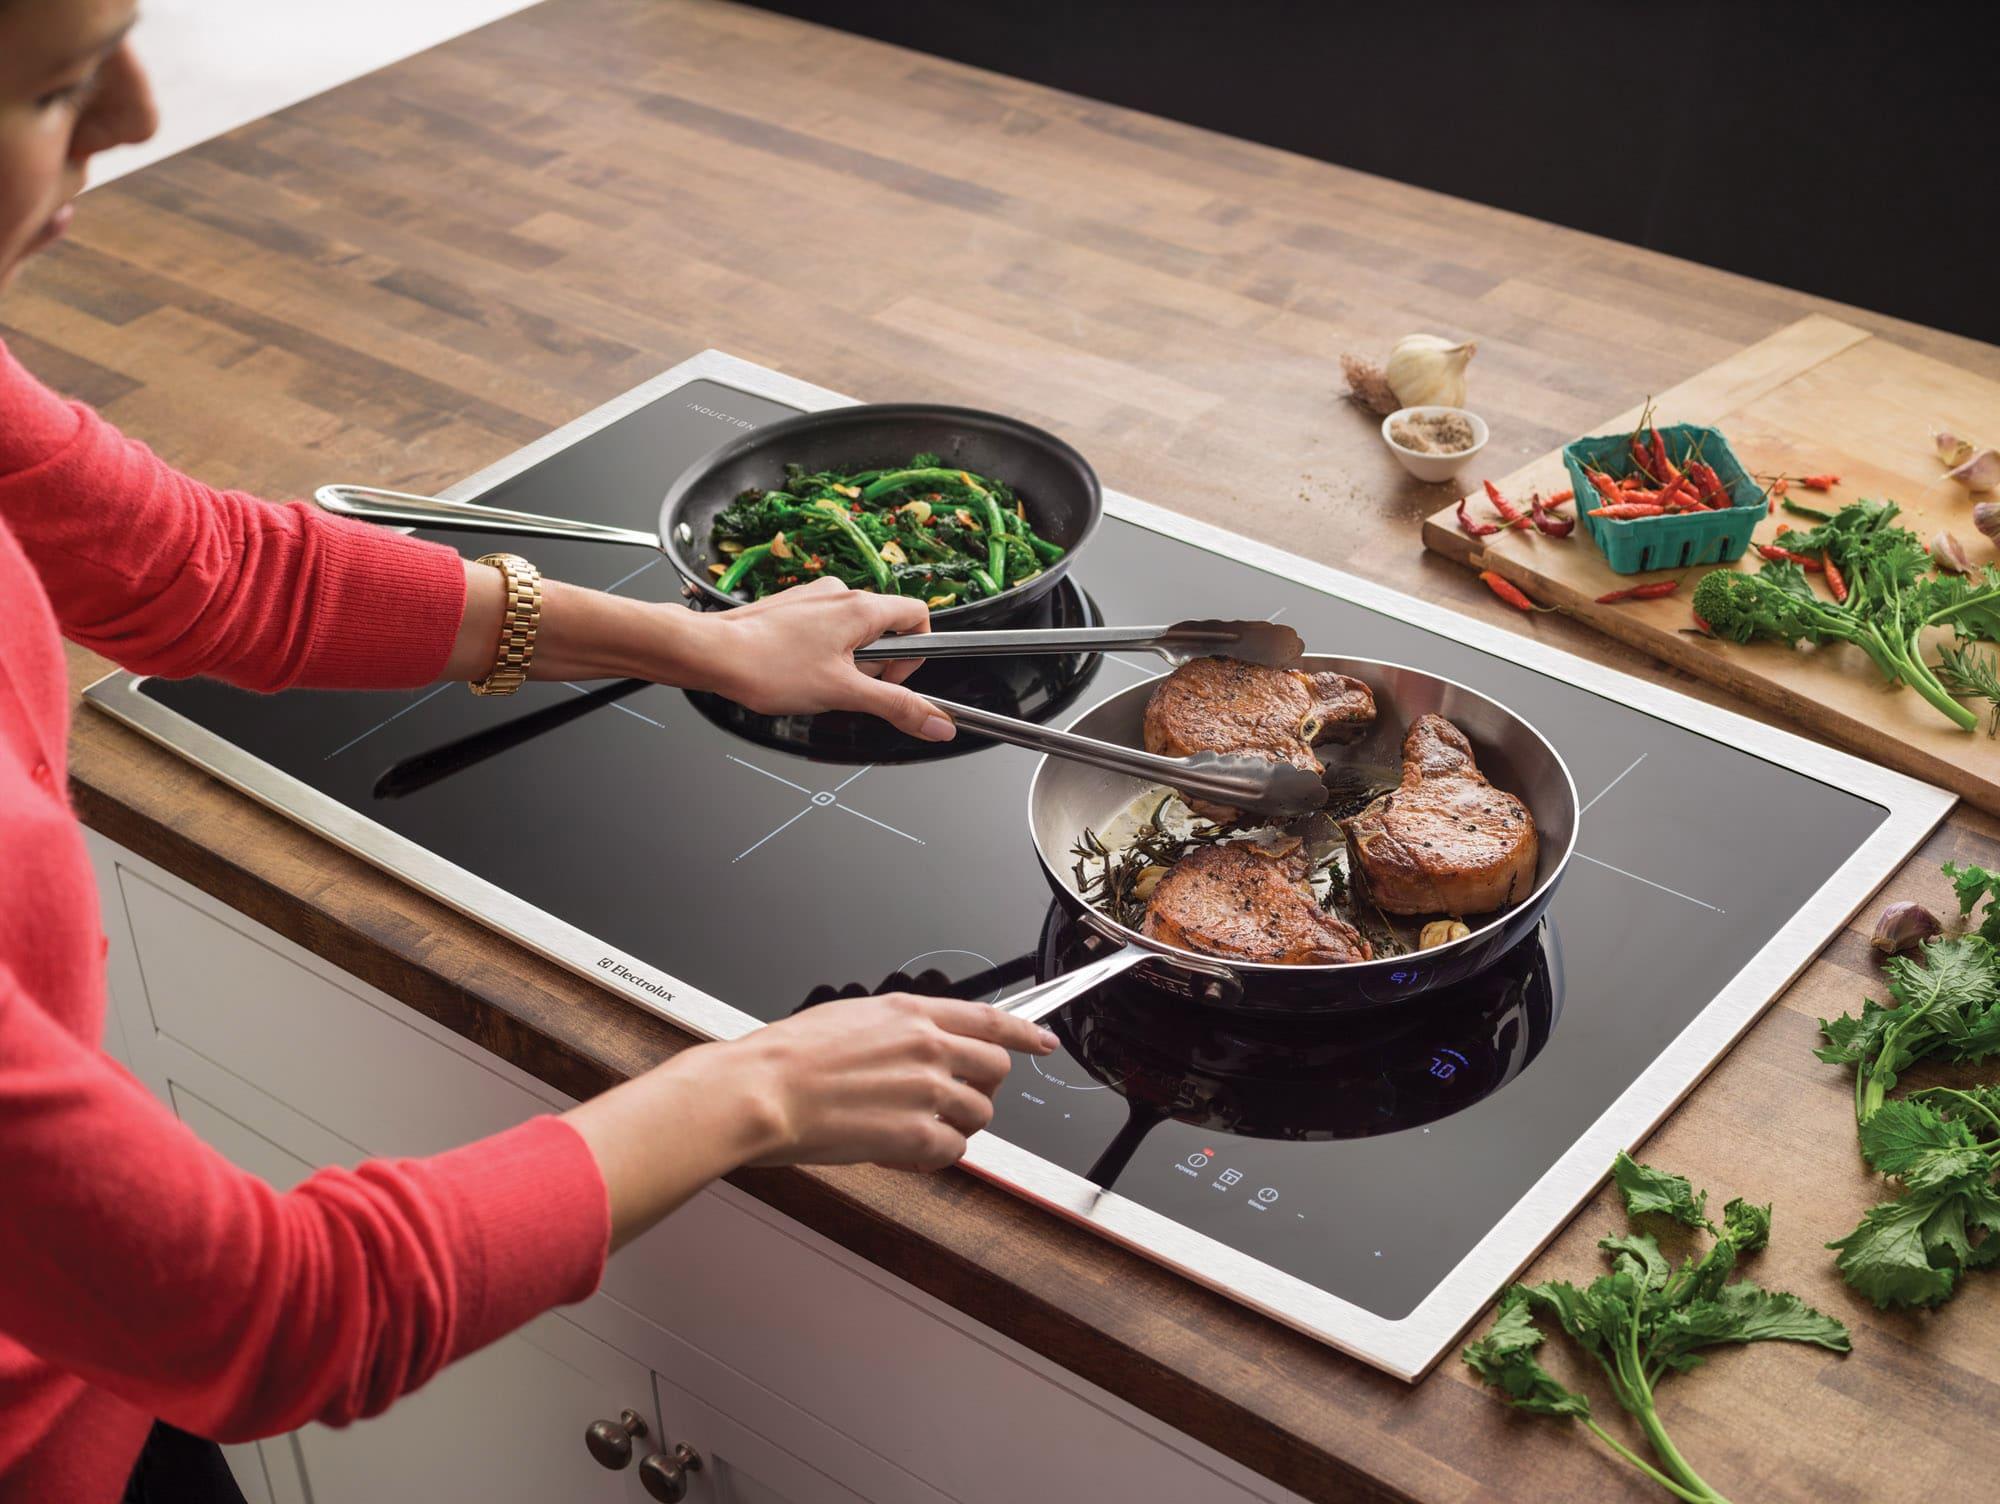 Piano cottura induzione come orientarsi fra opinioni - Cucina a induzione prezzi ...